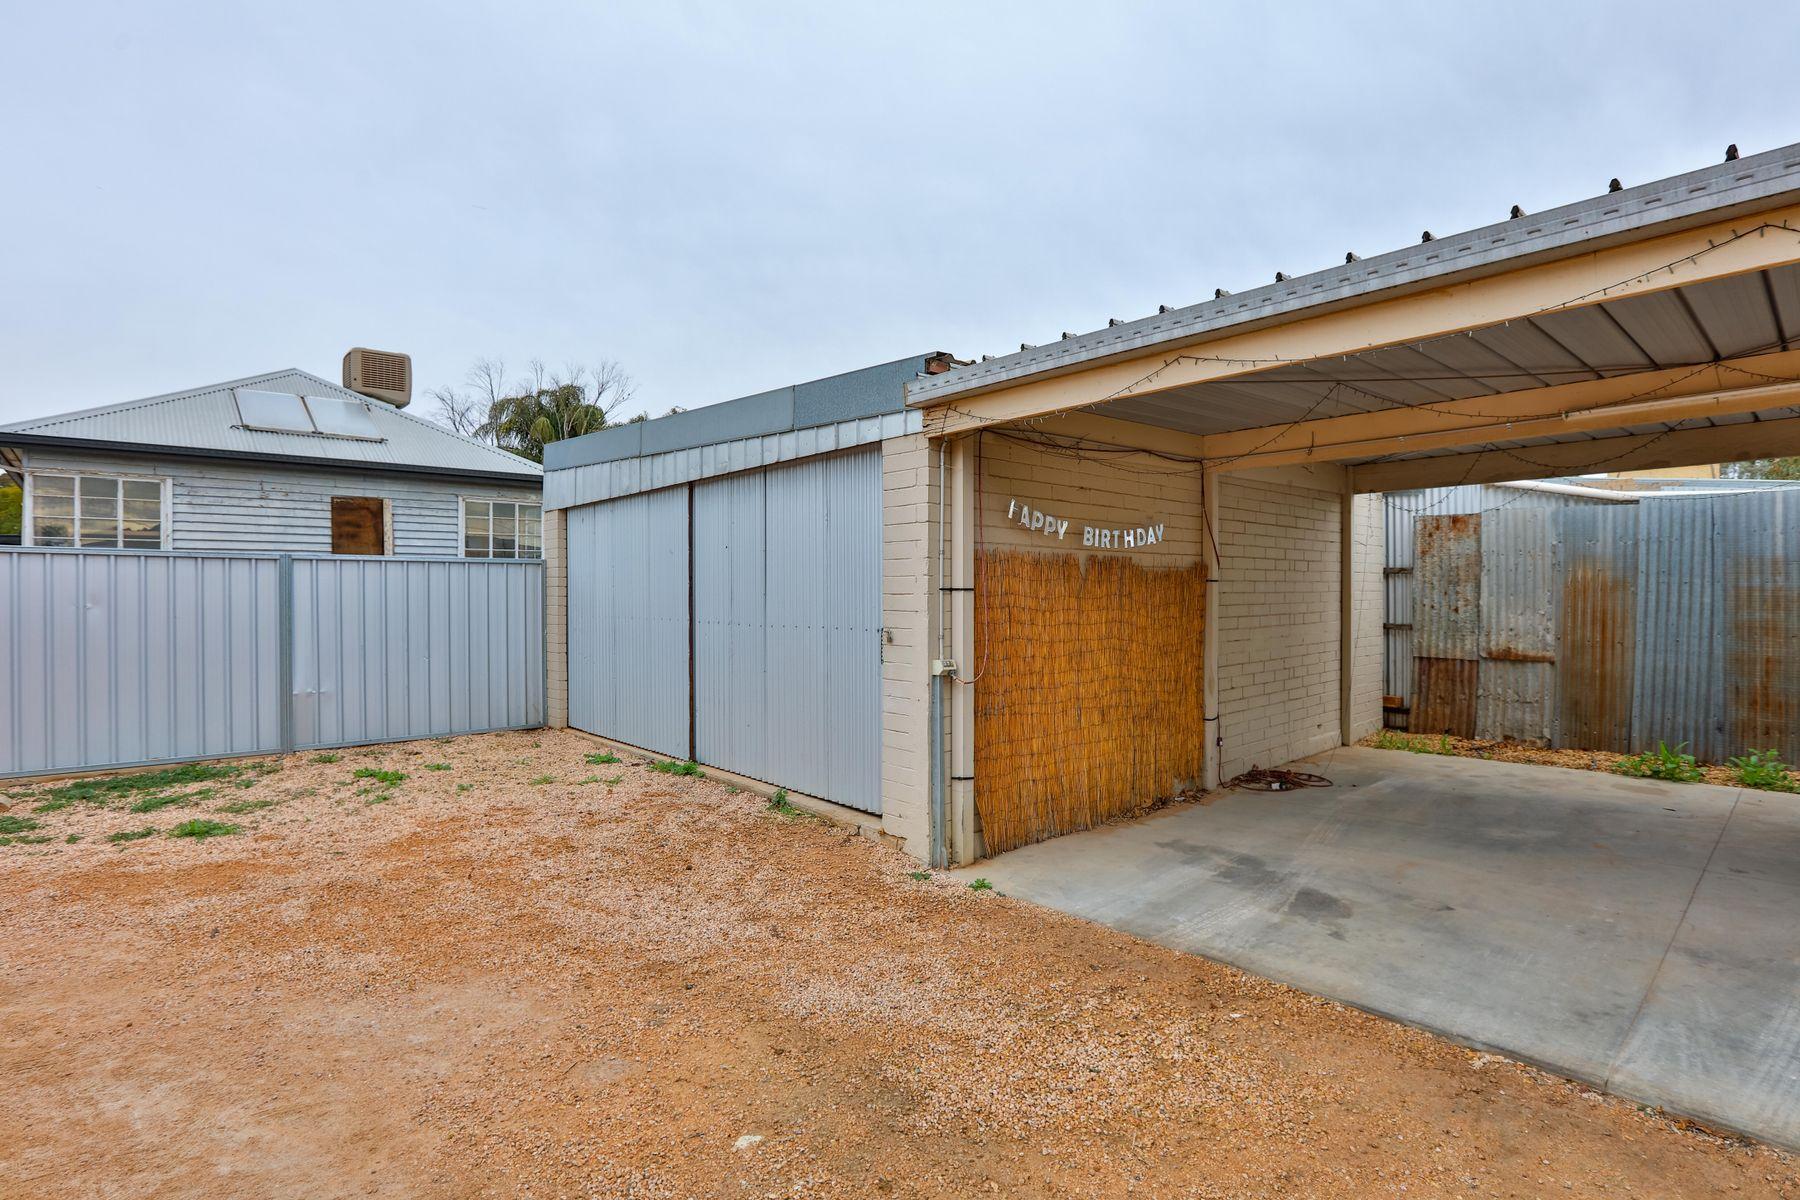 2 Ward Lane, Mildura, VIC 3500